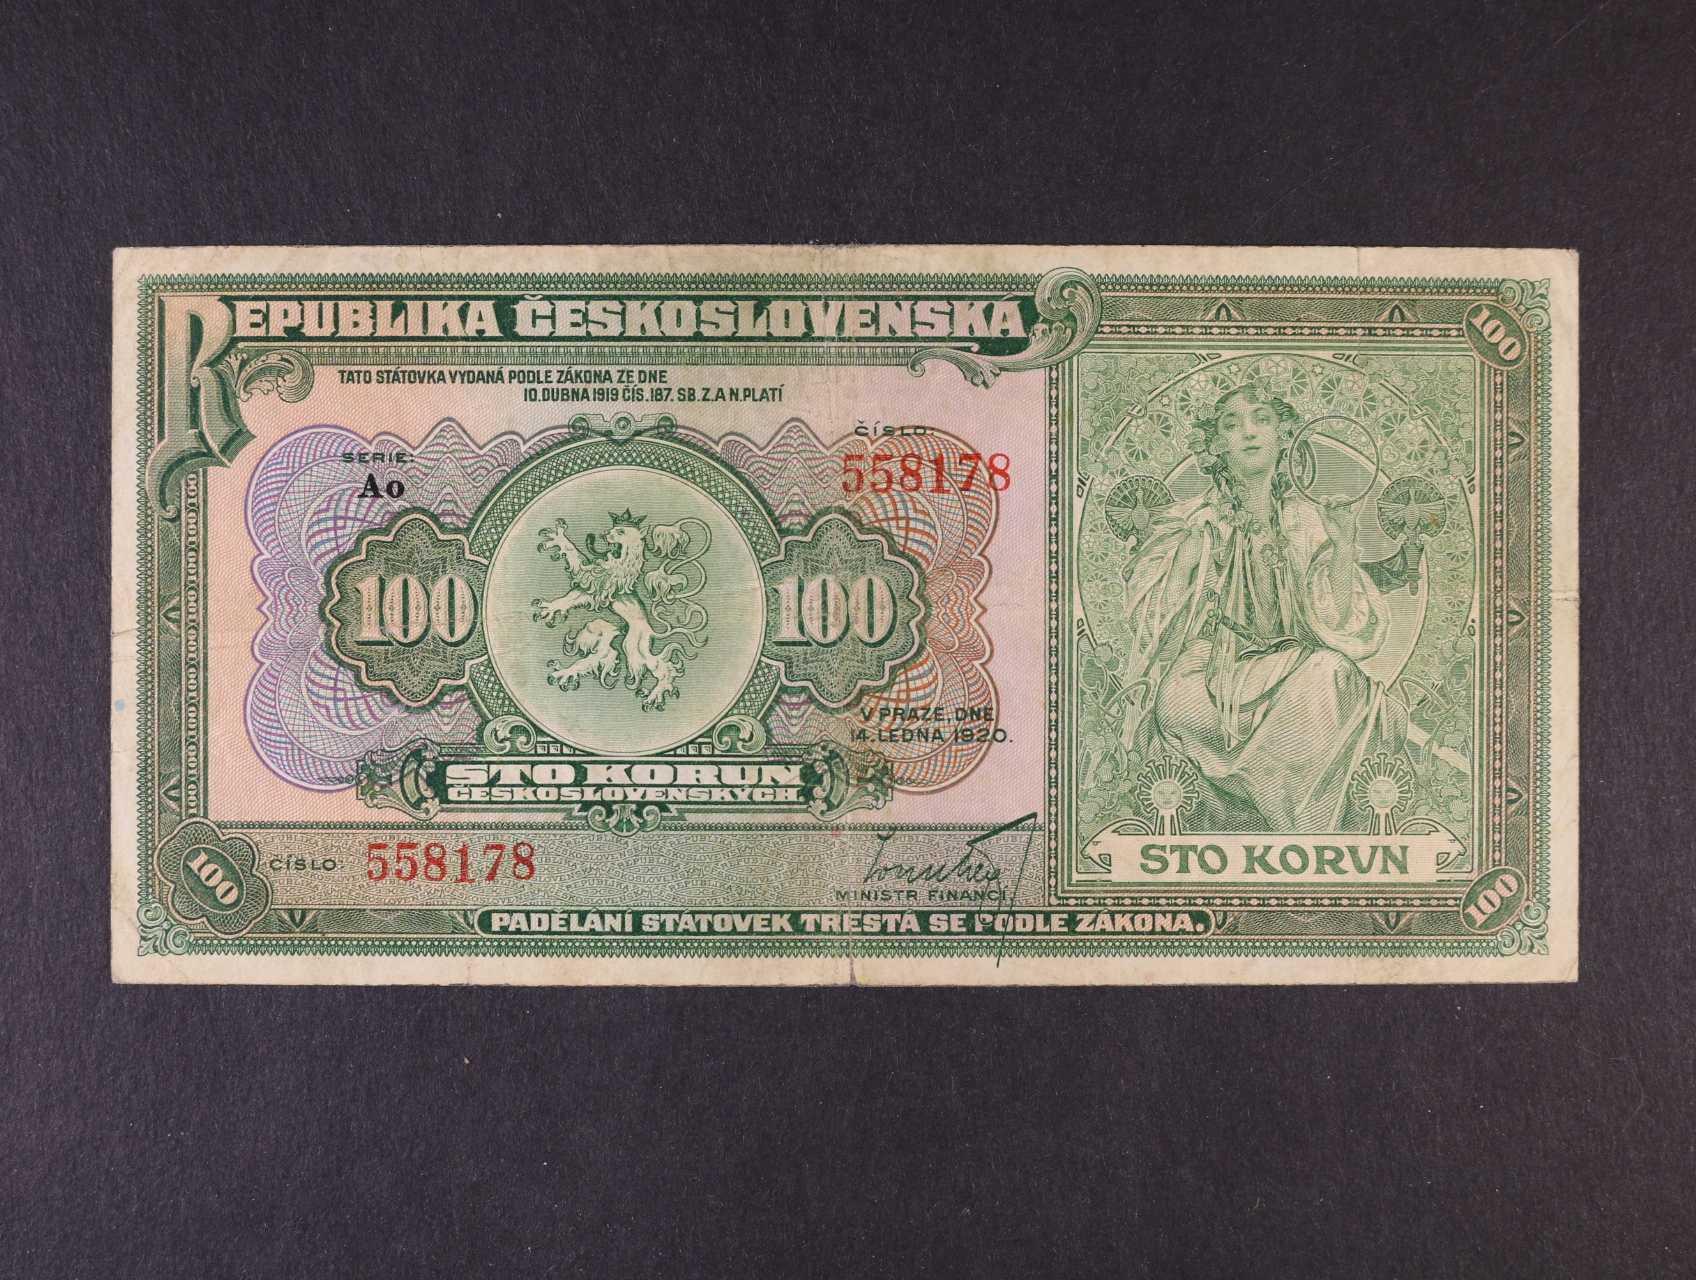 100 Kč 14.1.1920 série Ao, Ba. 16b, Pi. 17a